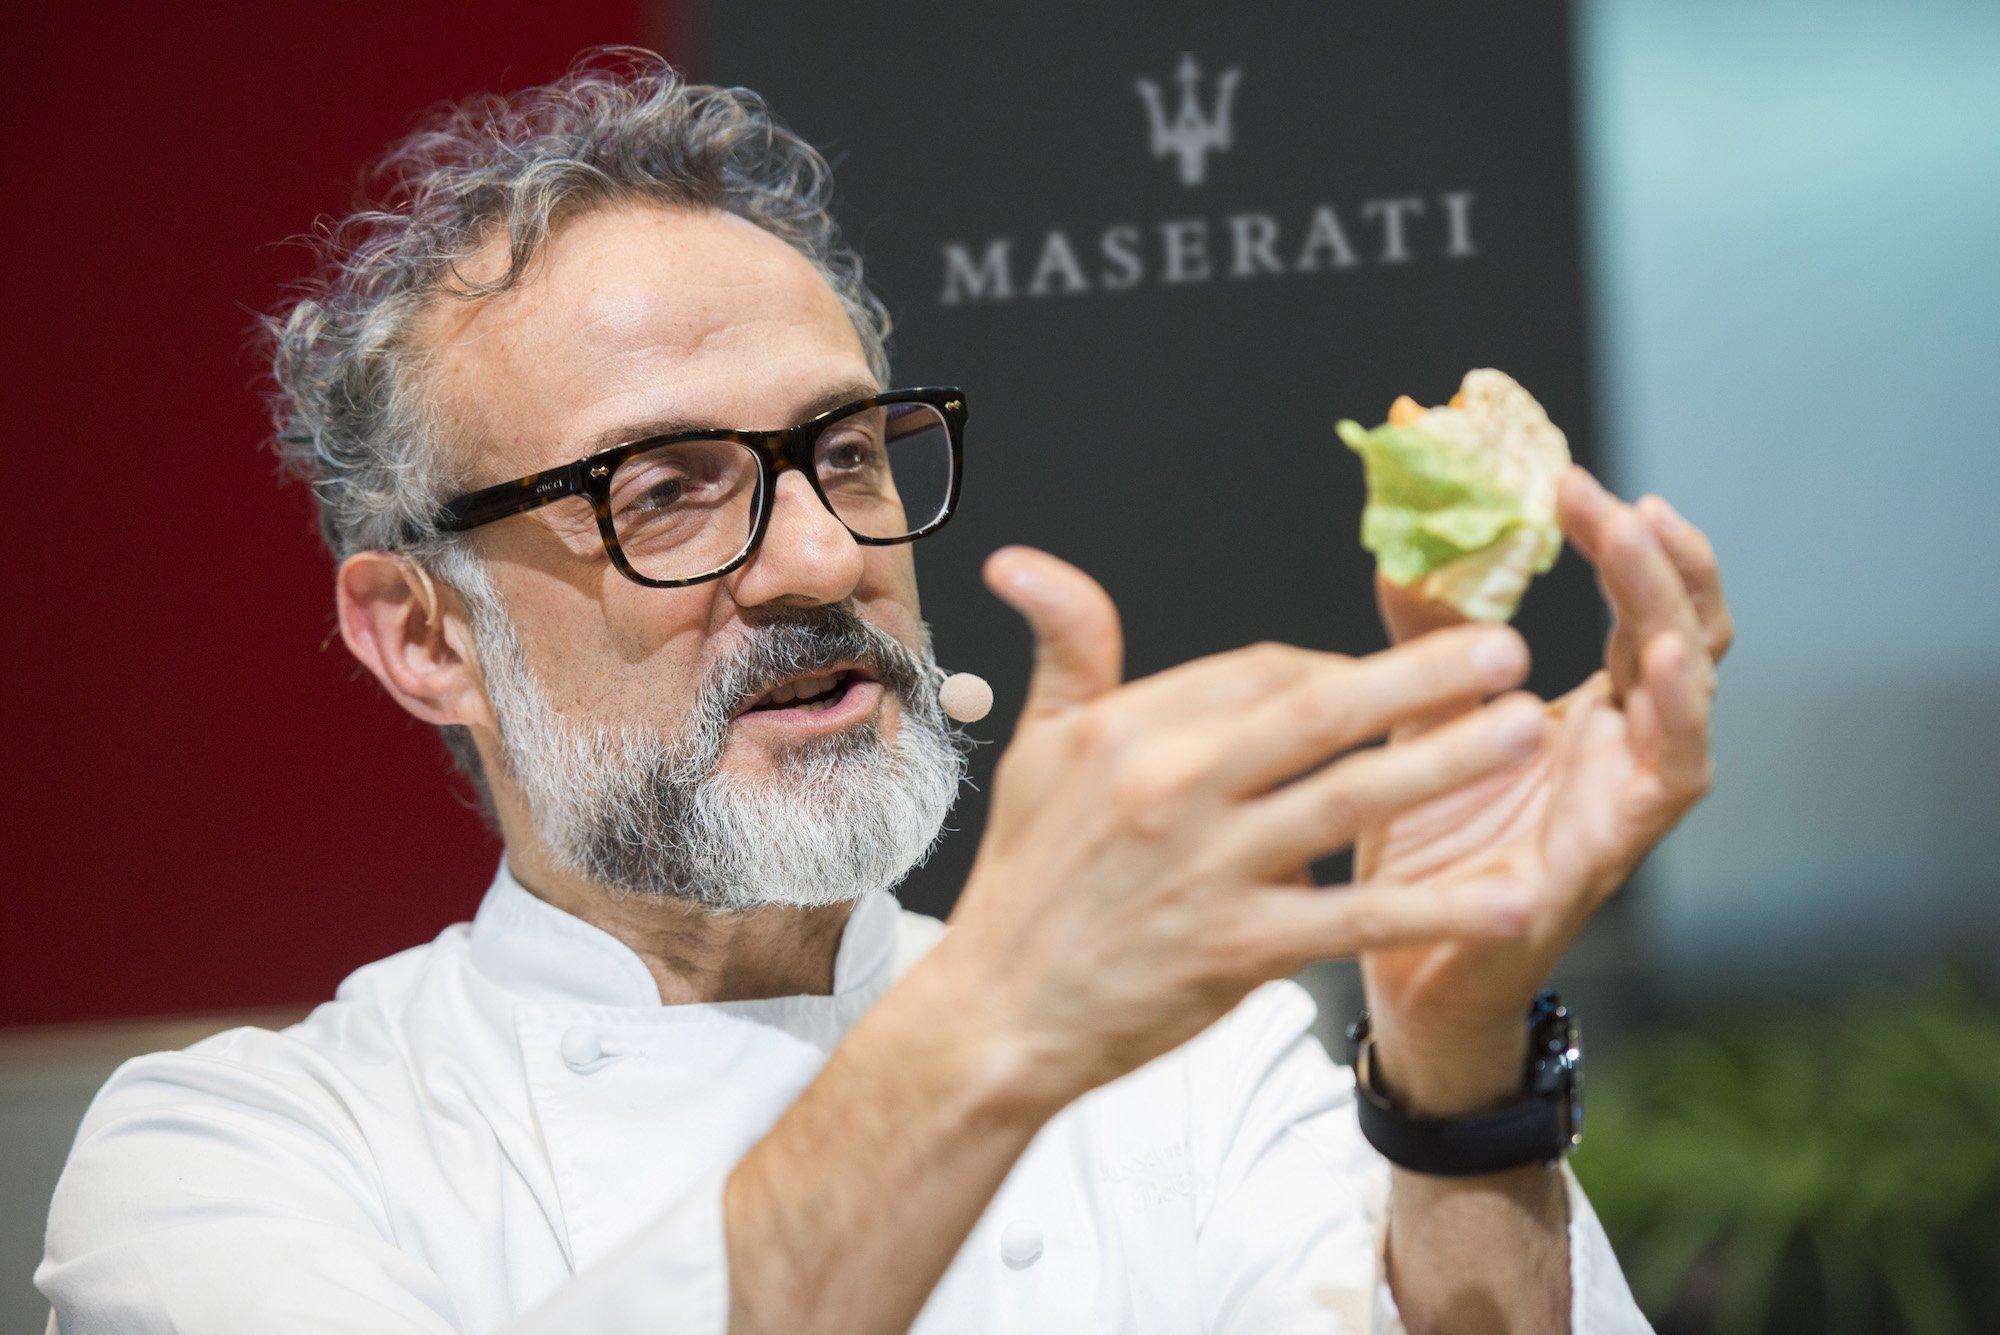 Massimo Bottura head chef at Modena's Osteria Francescana